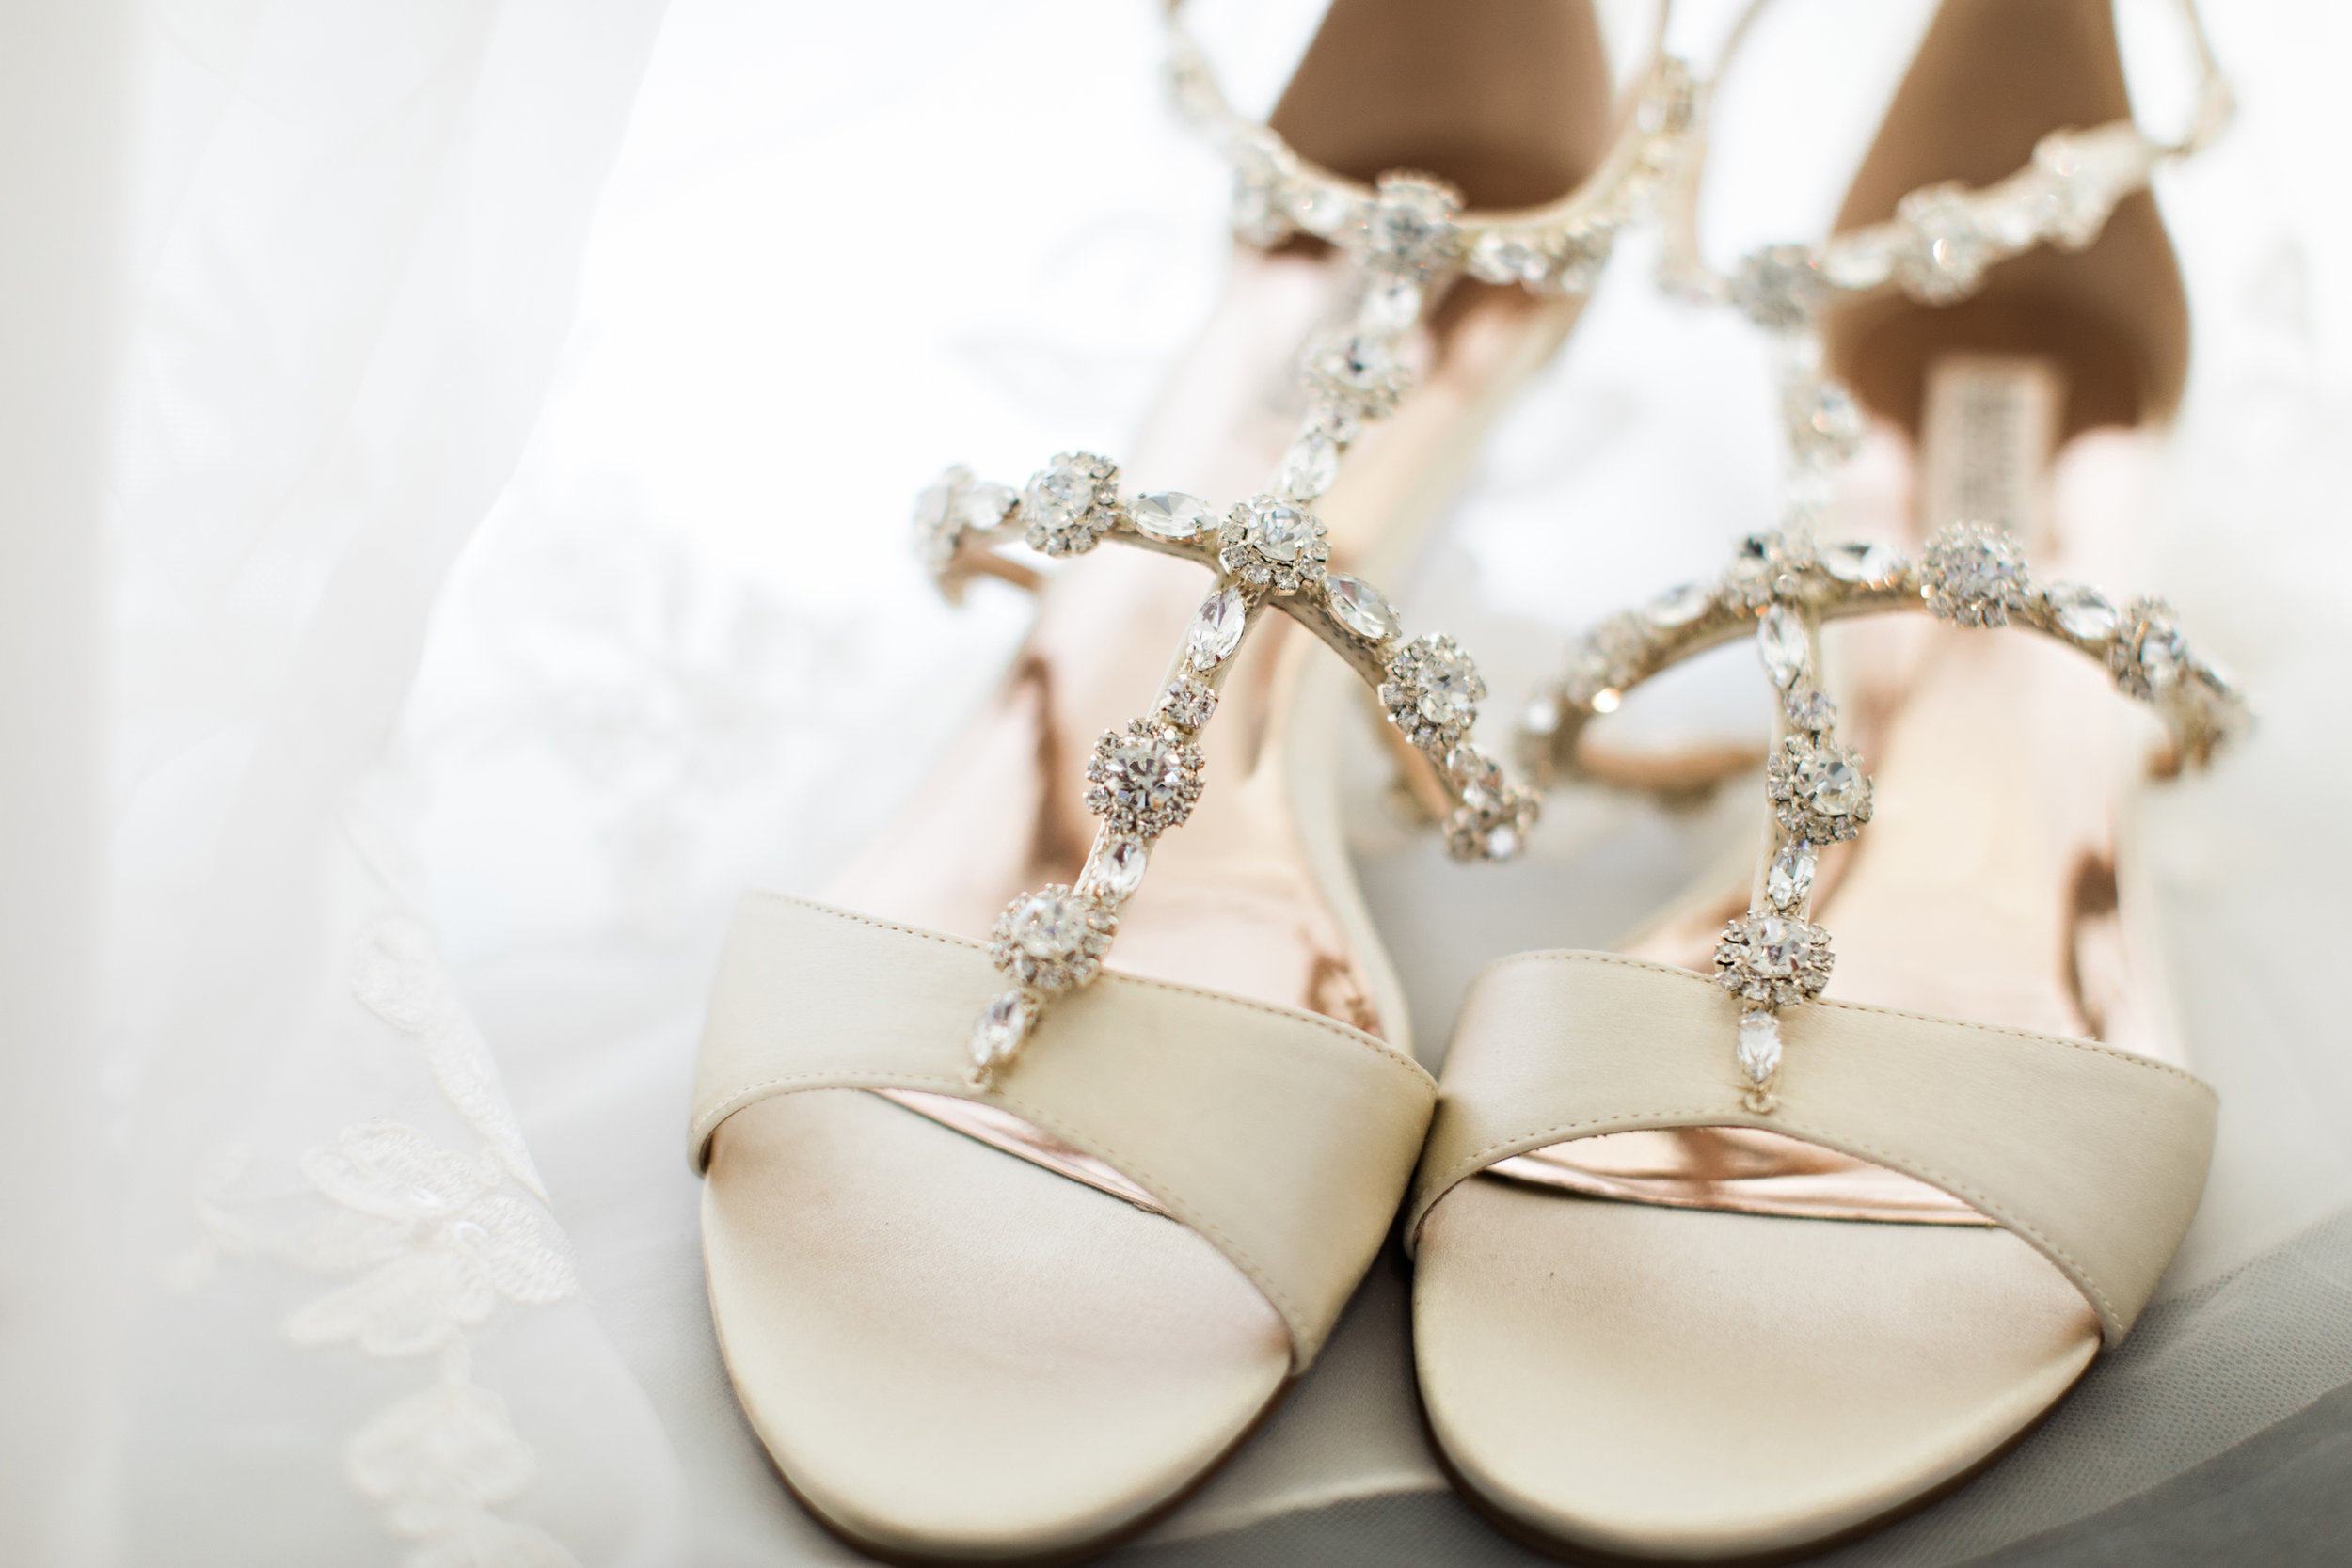 Ni ck-Drollette-Photography-Auburn-Alabama-Weddings-Sylvia-Kevin-100.jpg